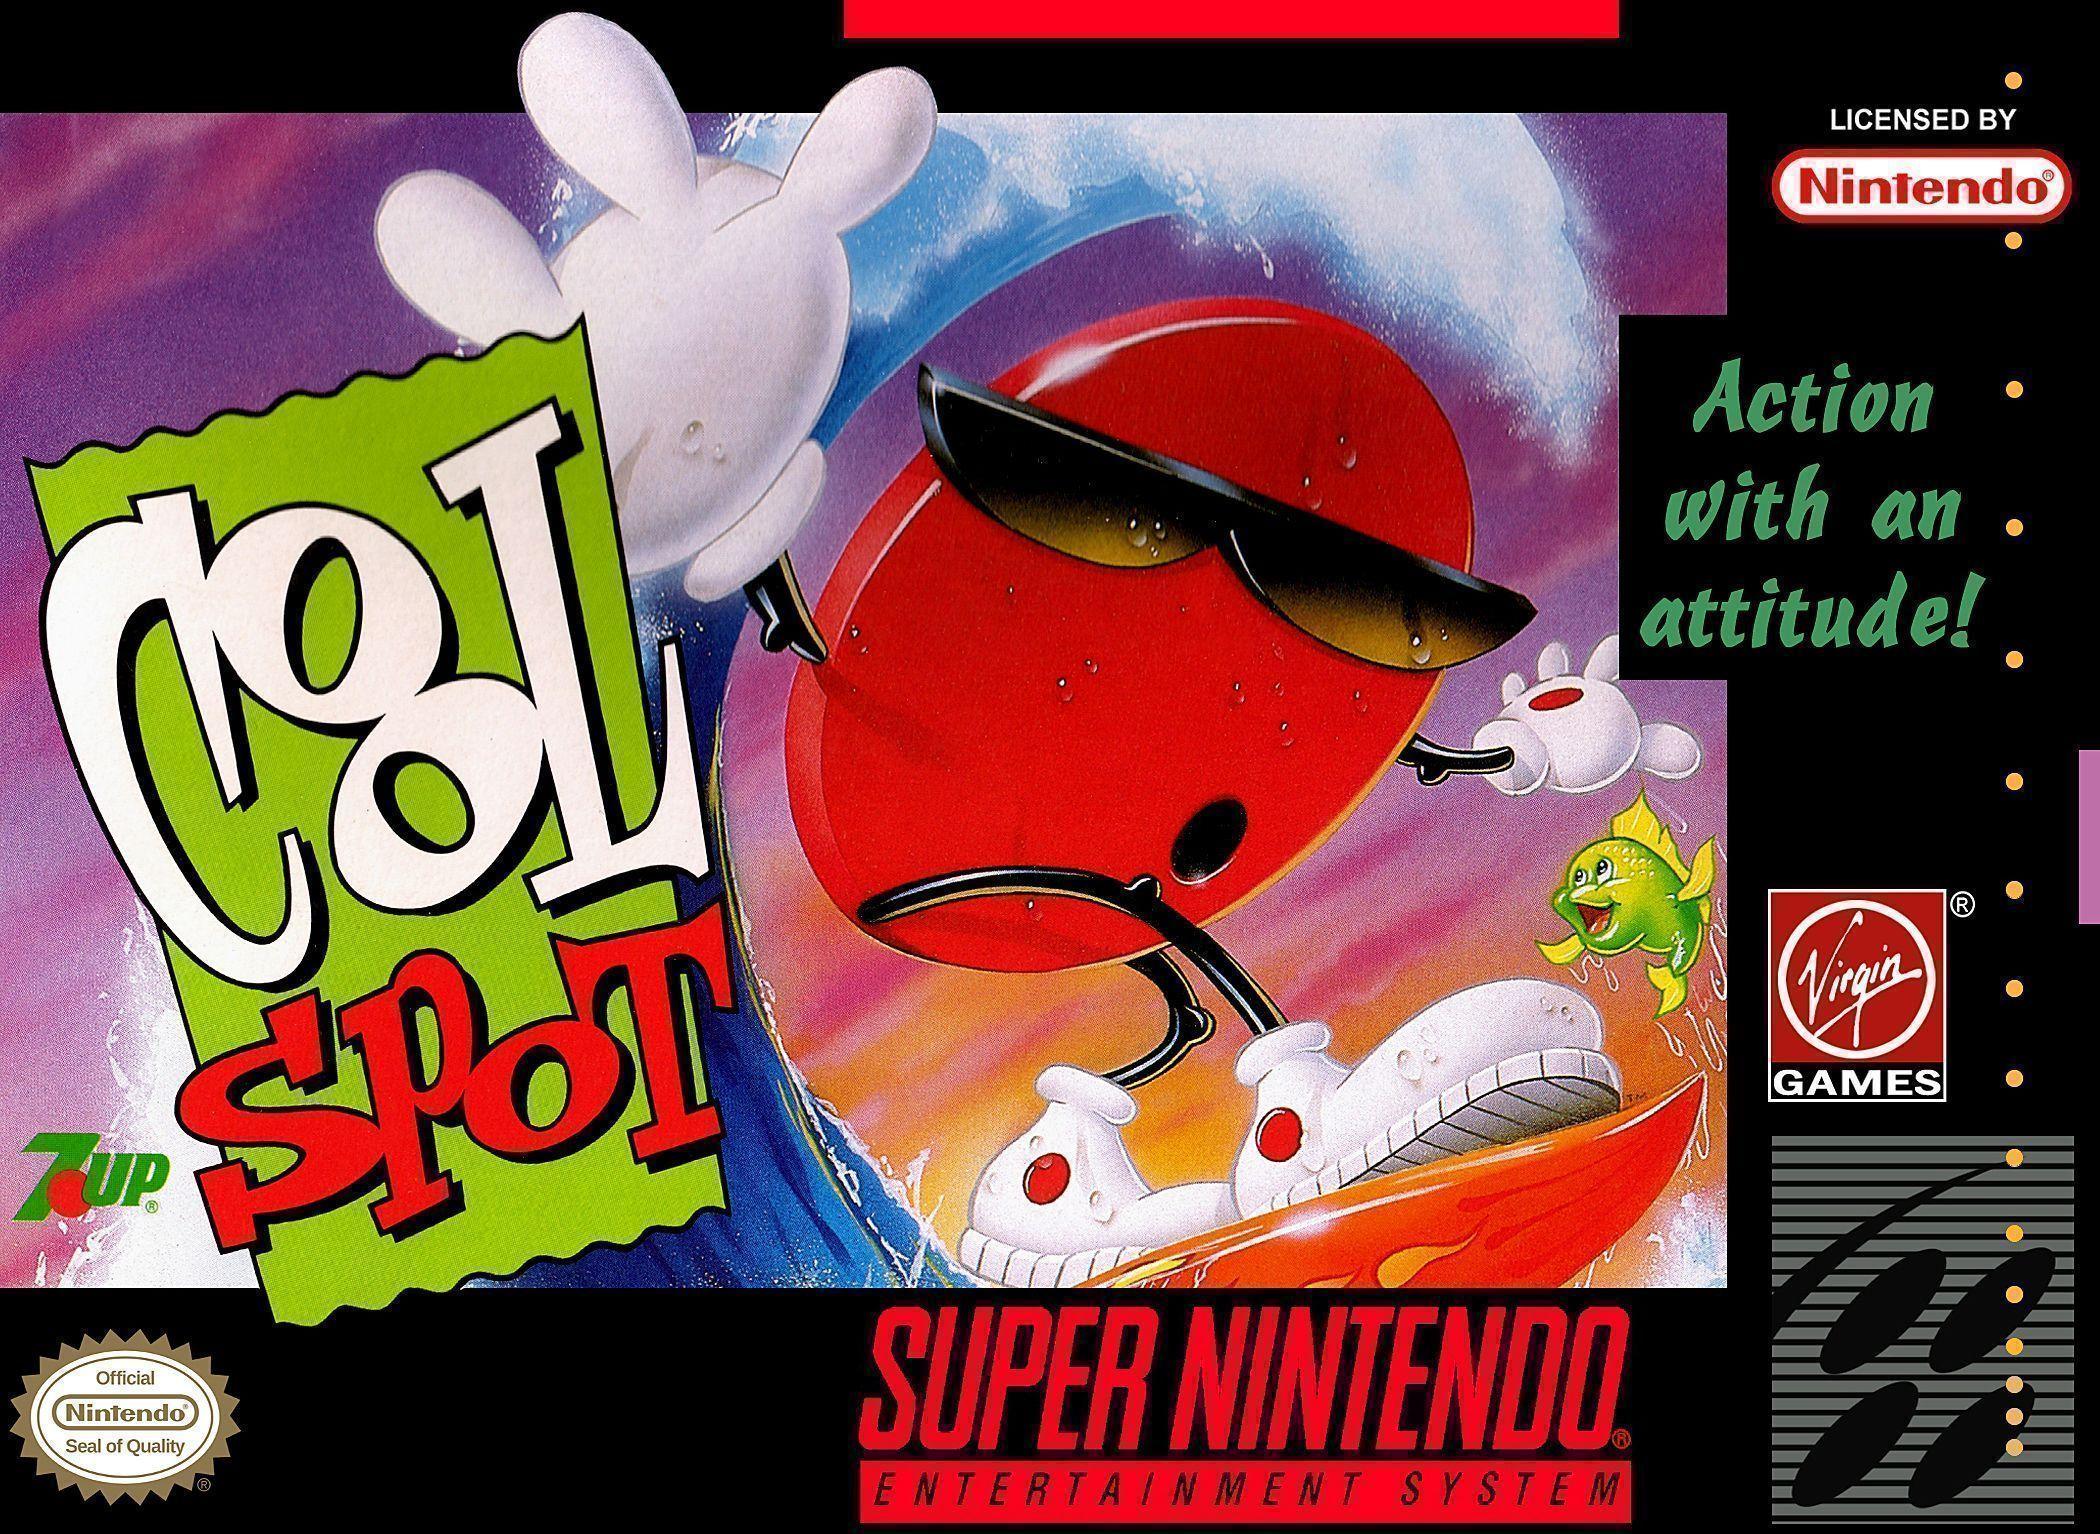 Cool Spot for Super Nintendo